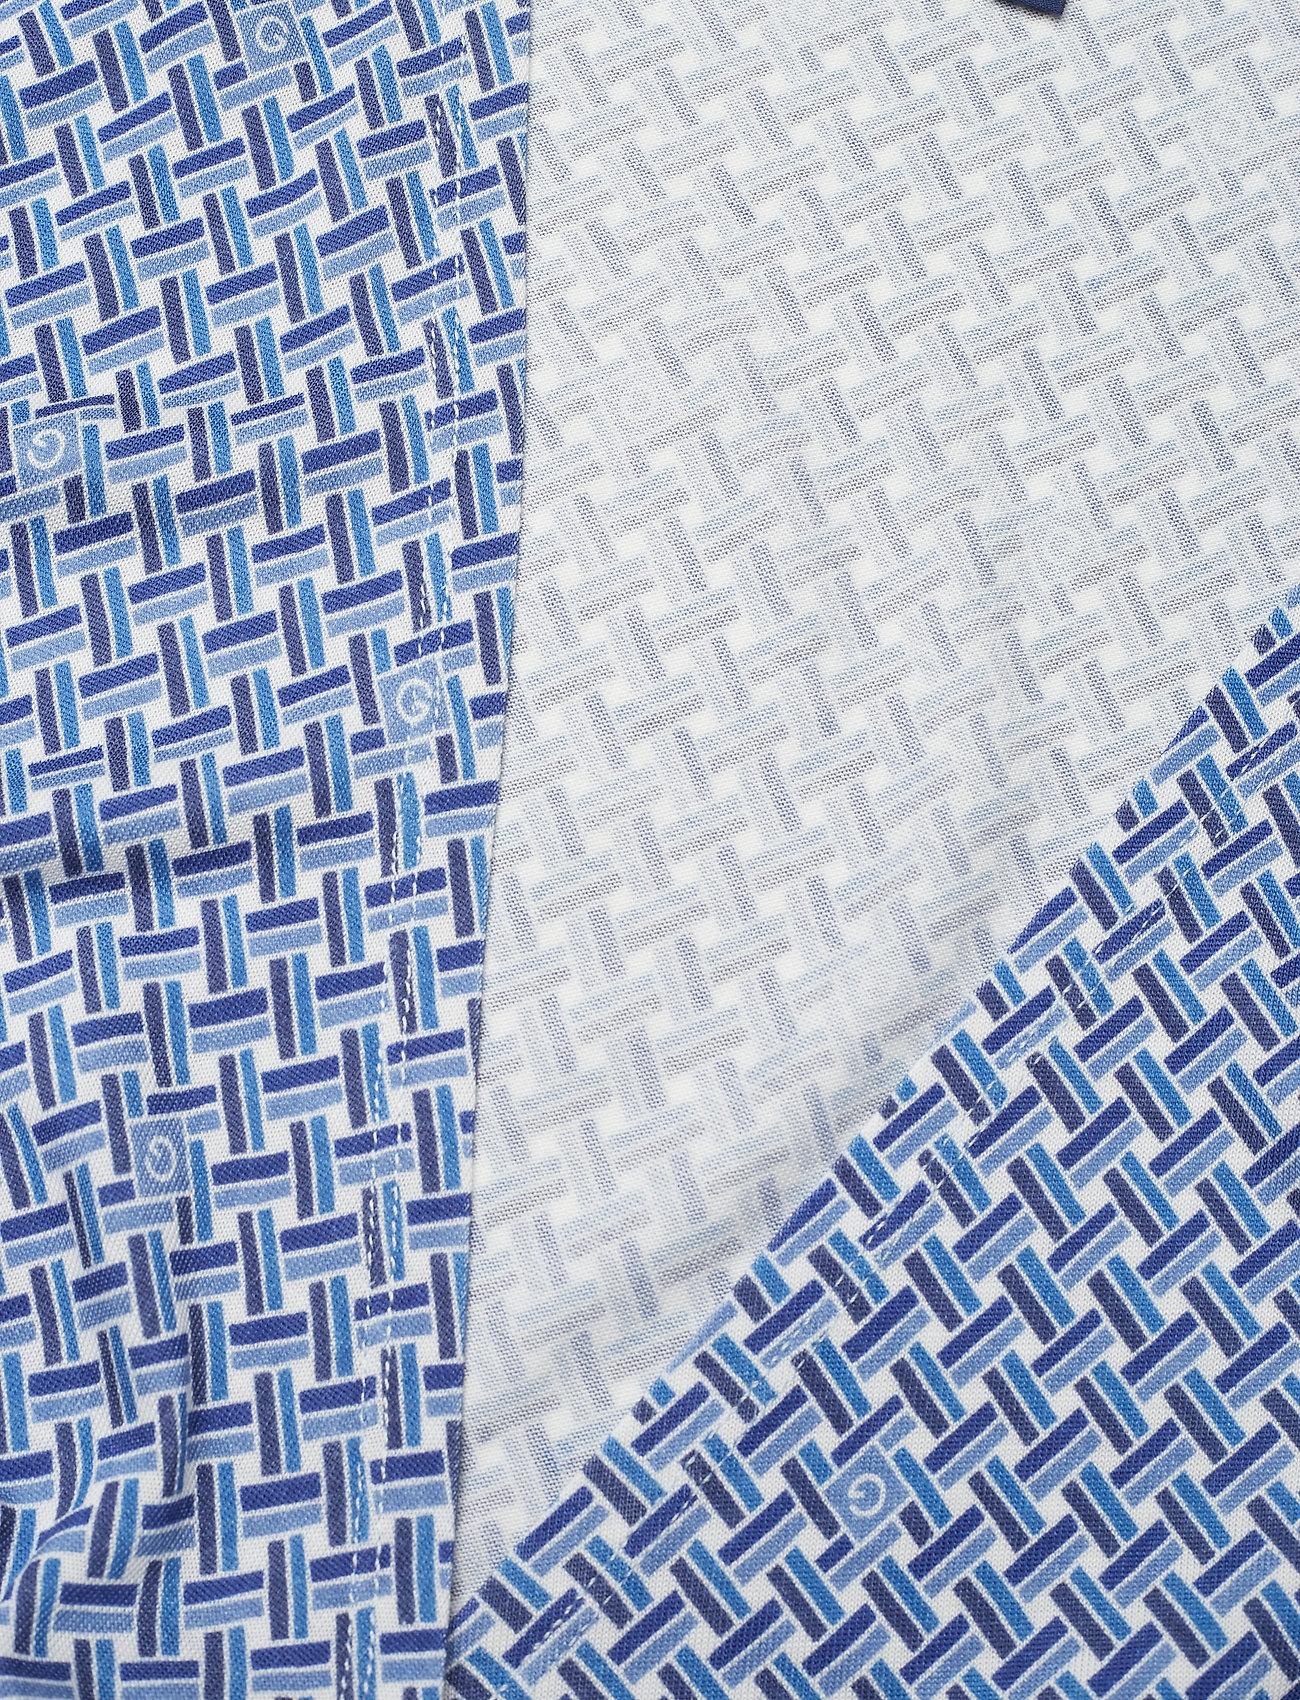 O1Signature Wrapdressevening Printed O1Signature Wrapdressevening Printed Printed Wrapdressevening O1Signature BlueGant BlueGant BlueGant O1Signature PknOXN80Zw